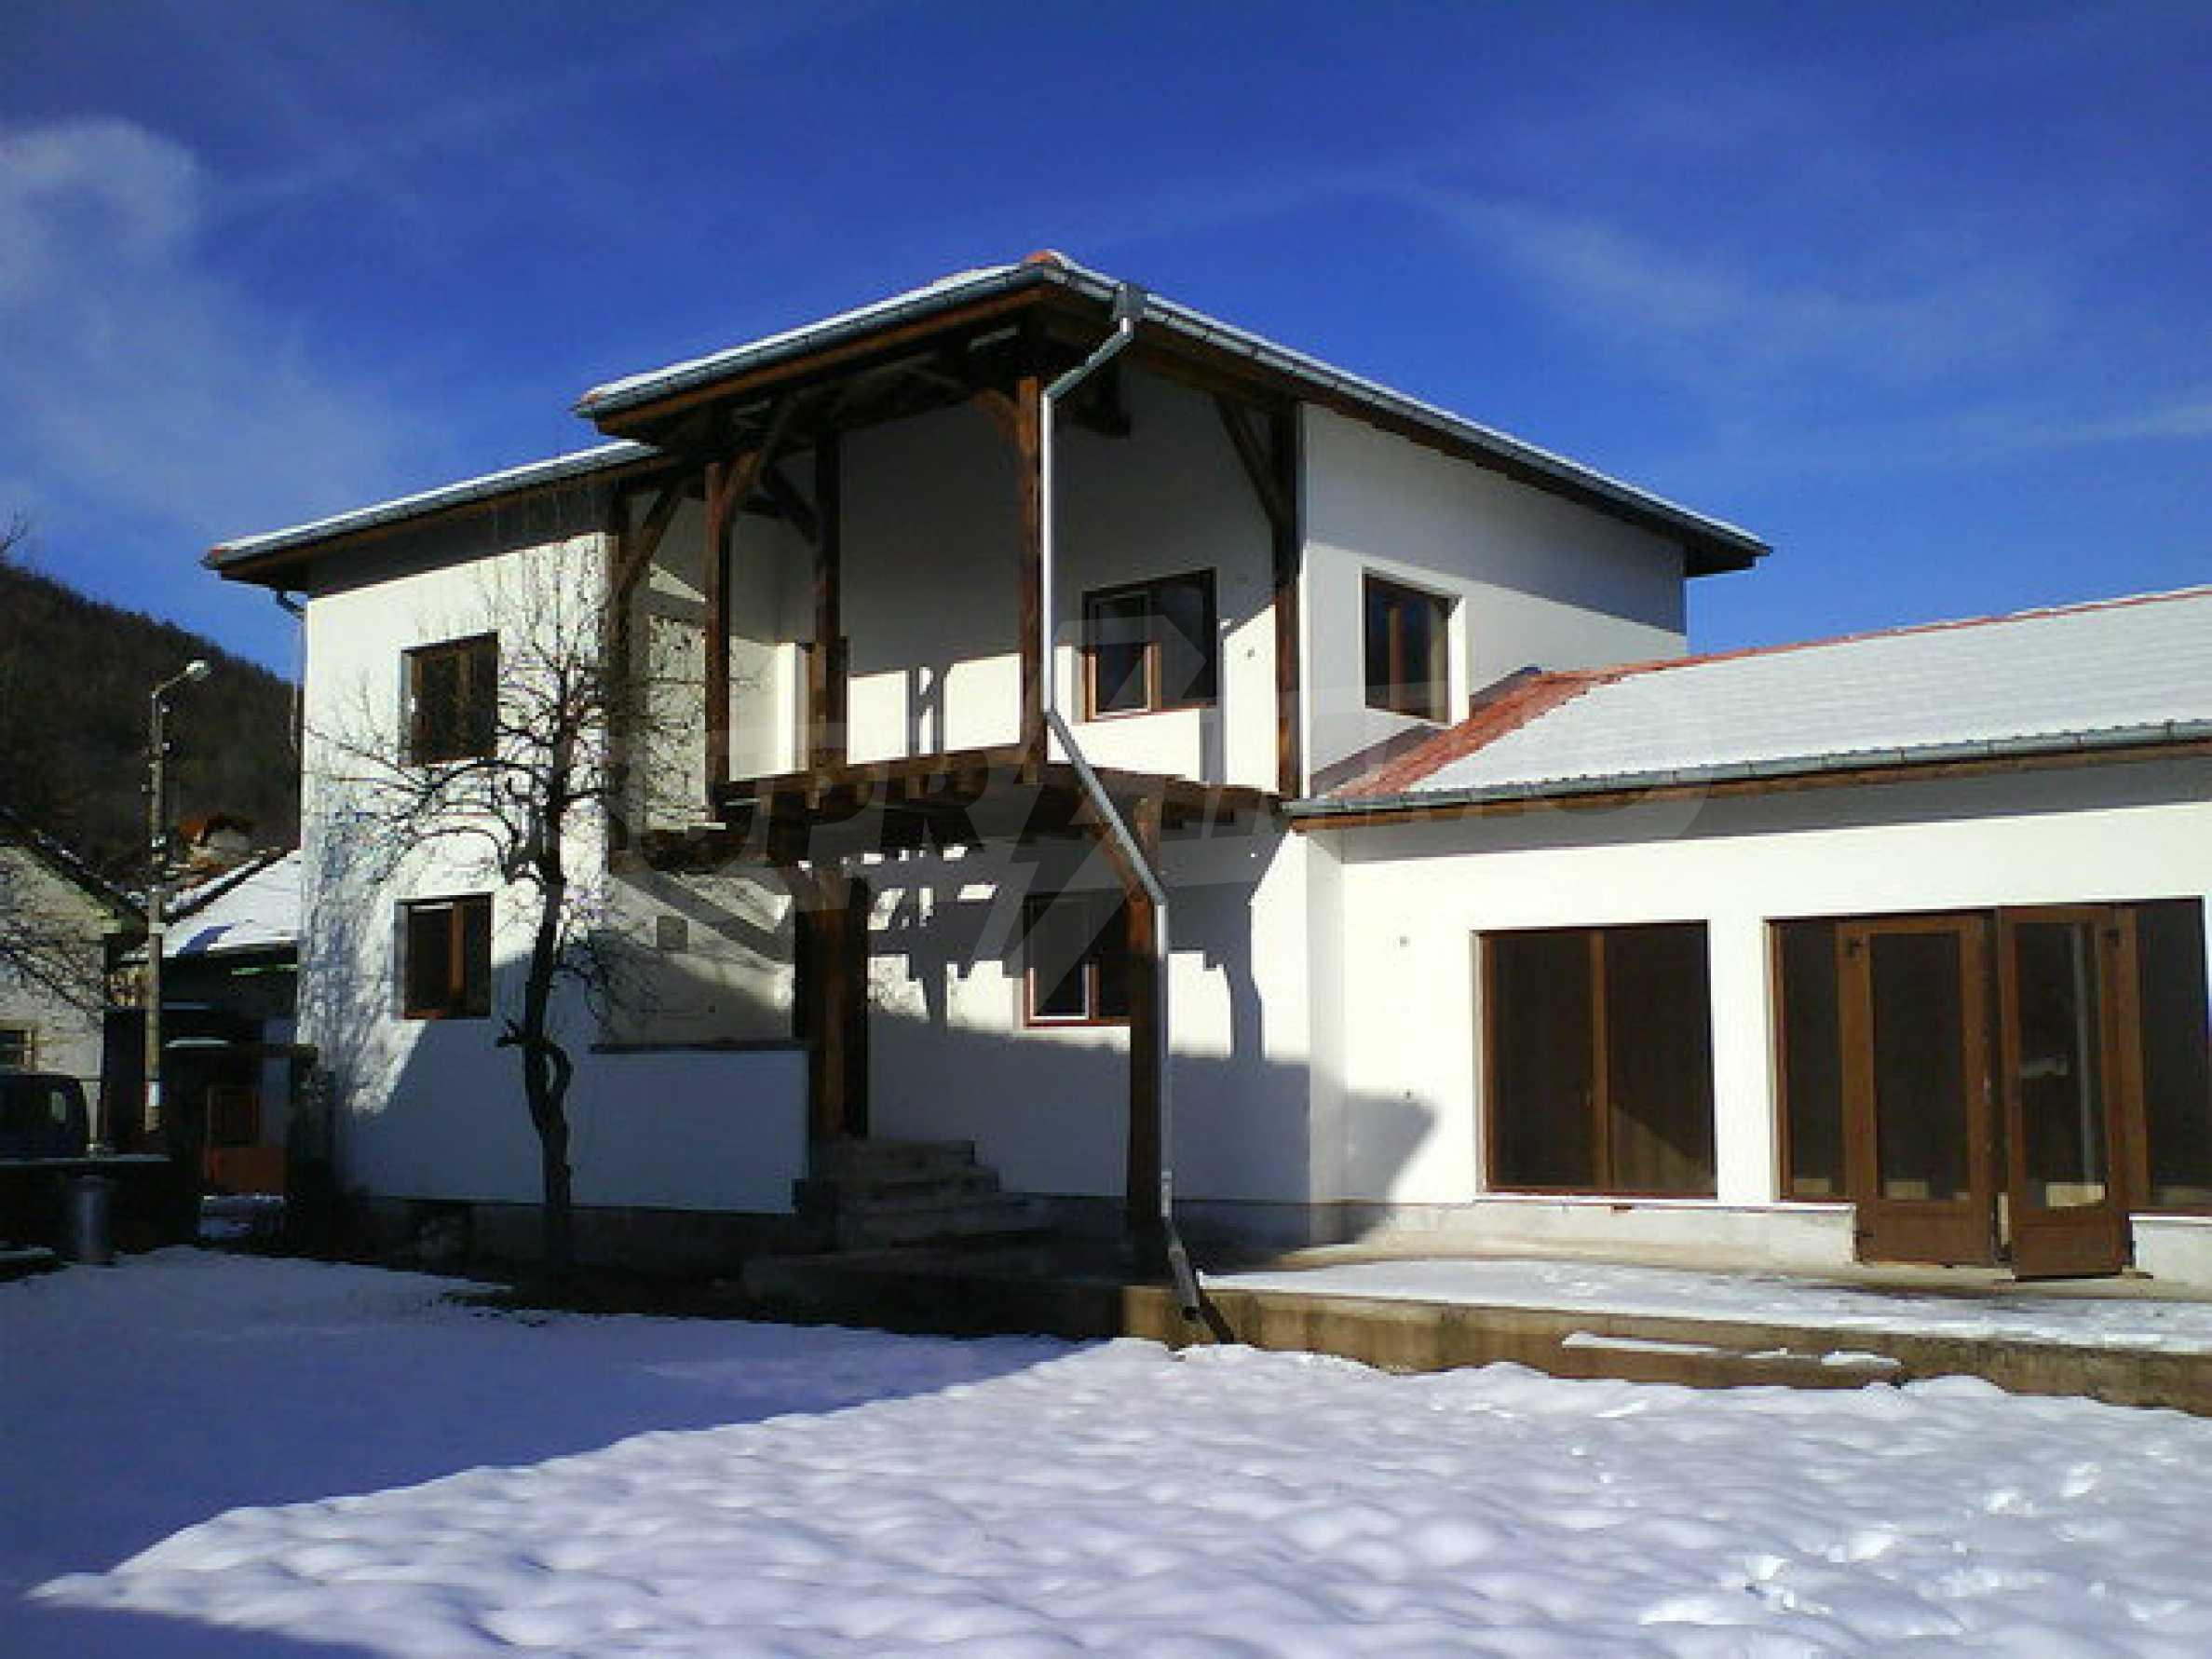 Two storey house in village near Sopot Dam